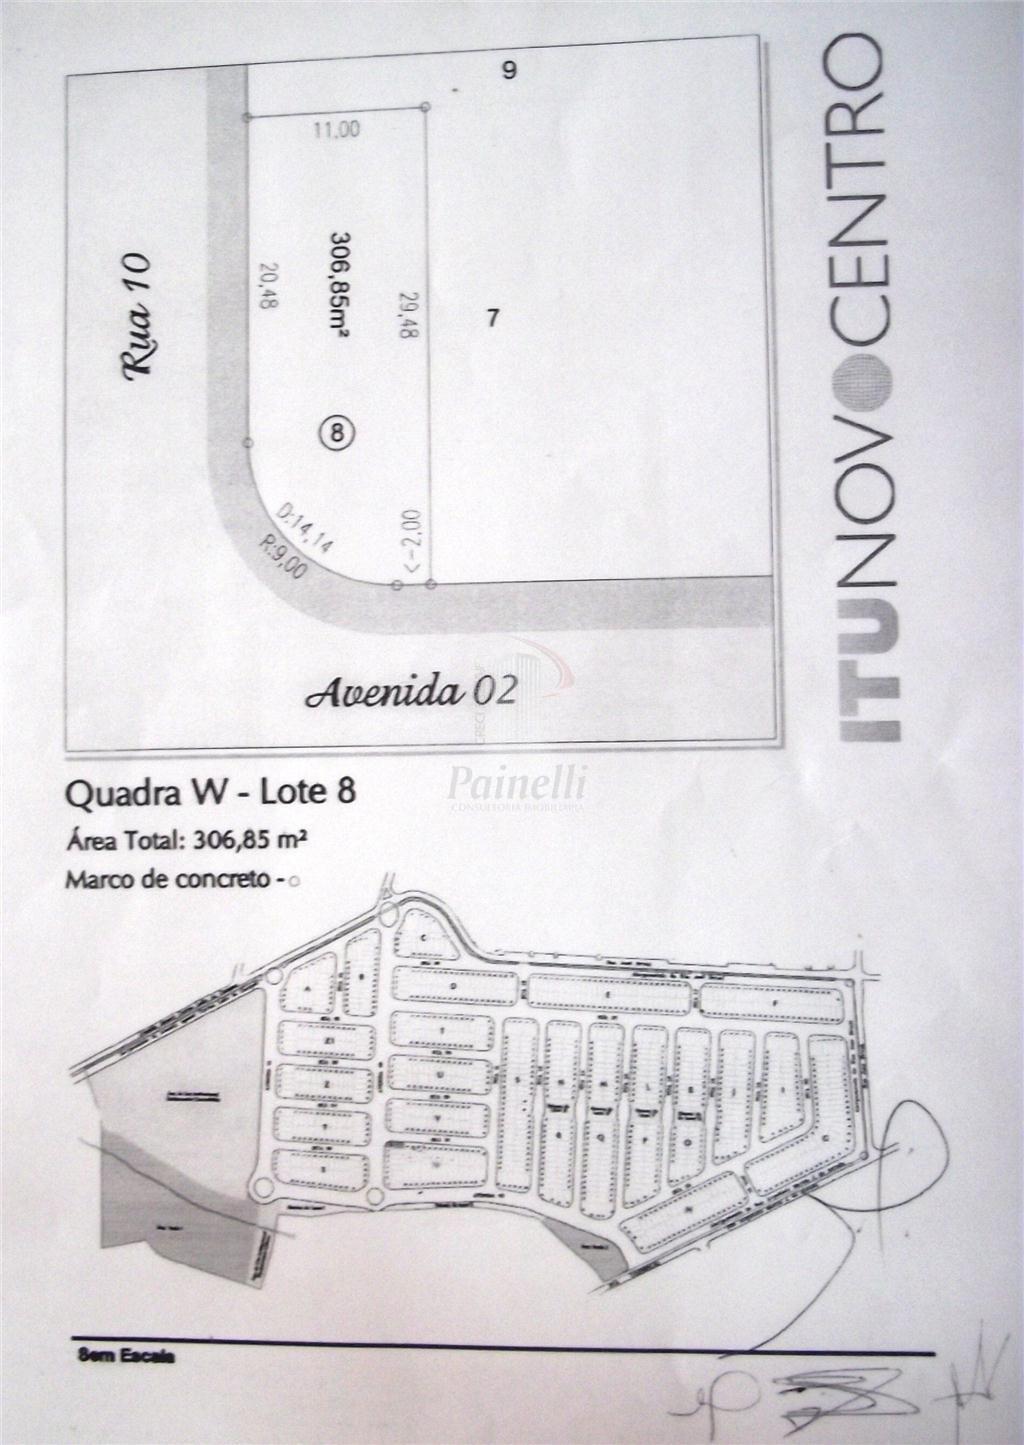 Terreno Residencial à venda, São Luiz, Itu - TE0044.